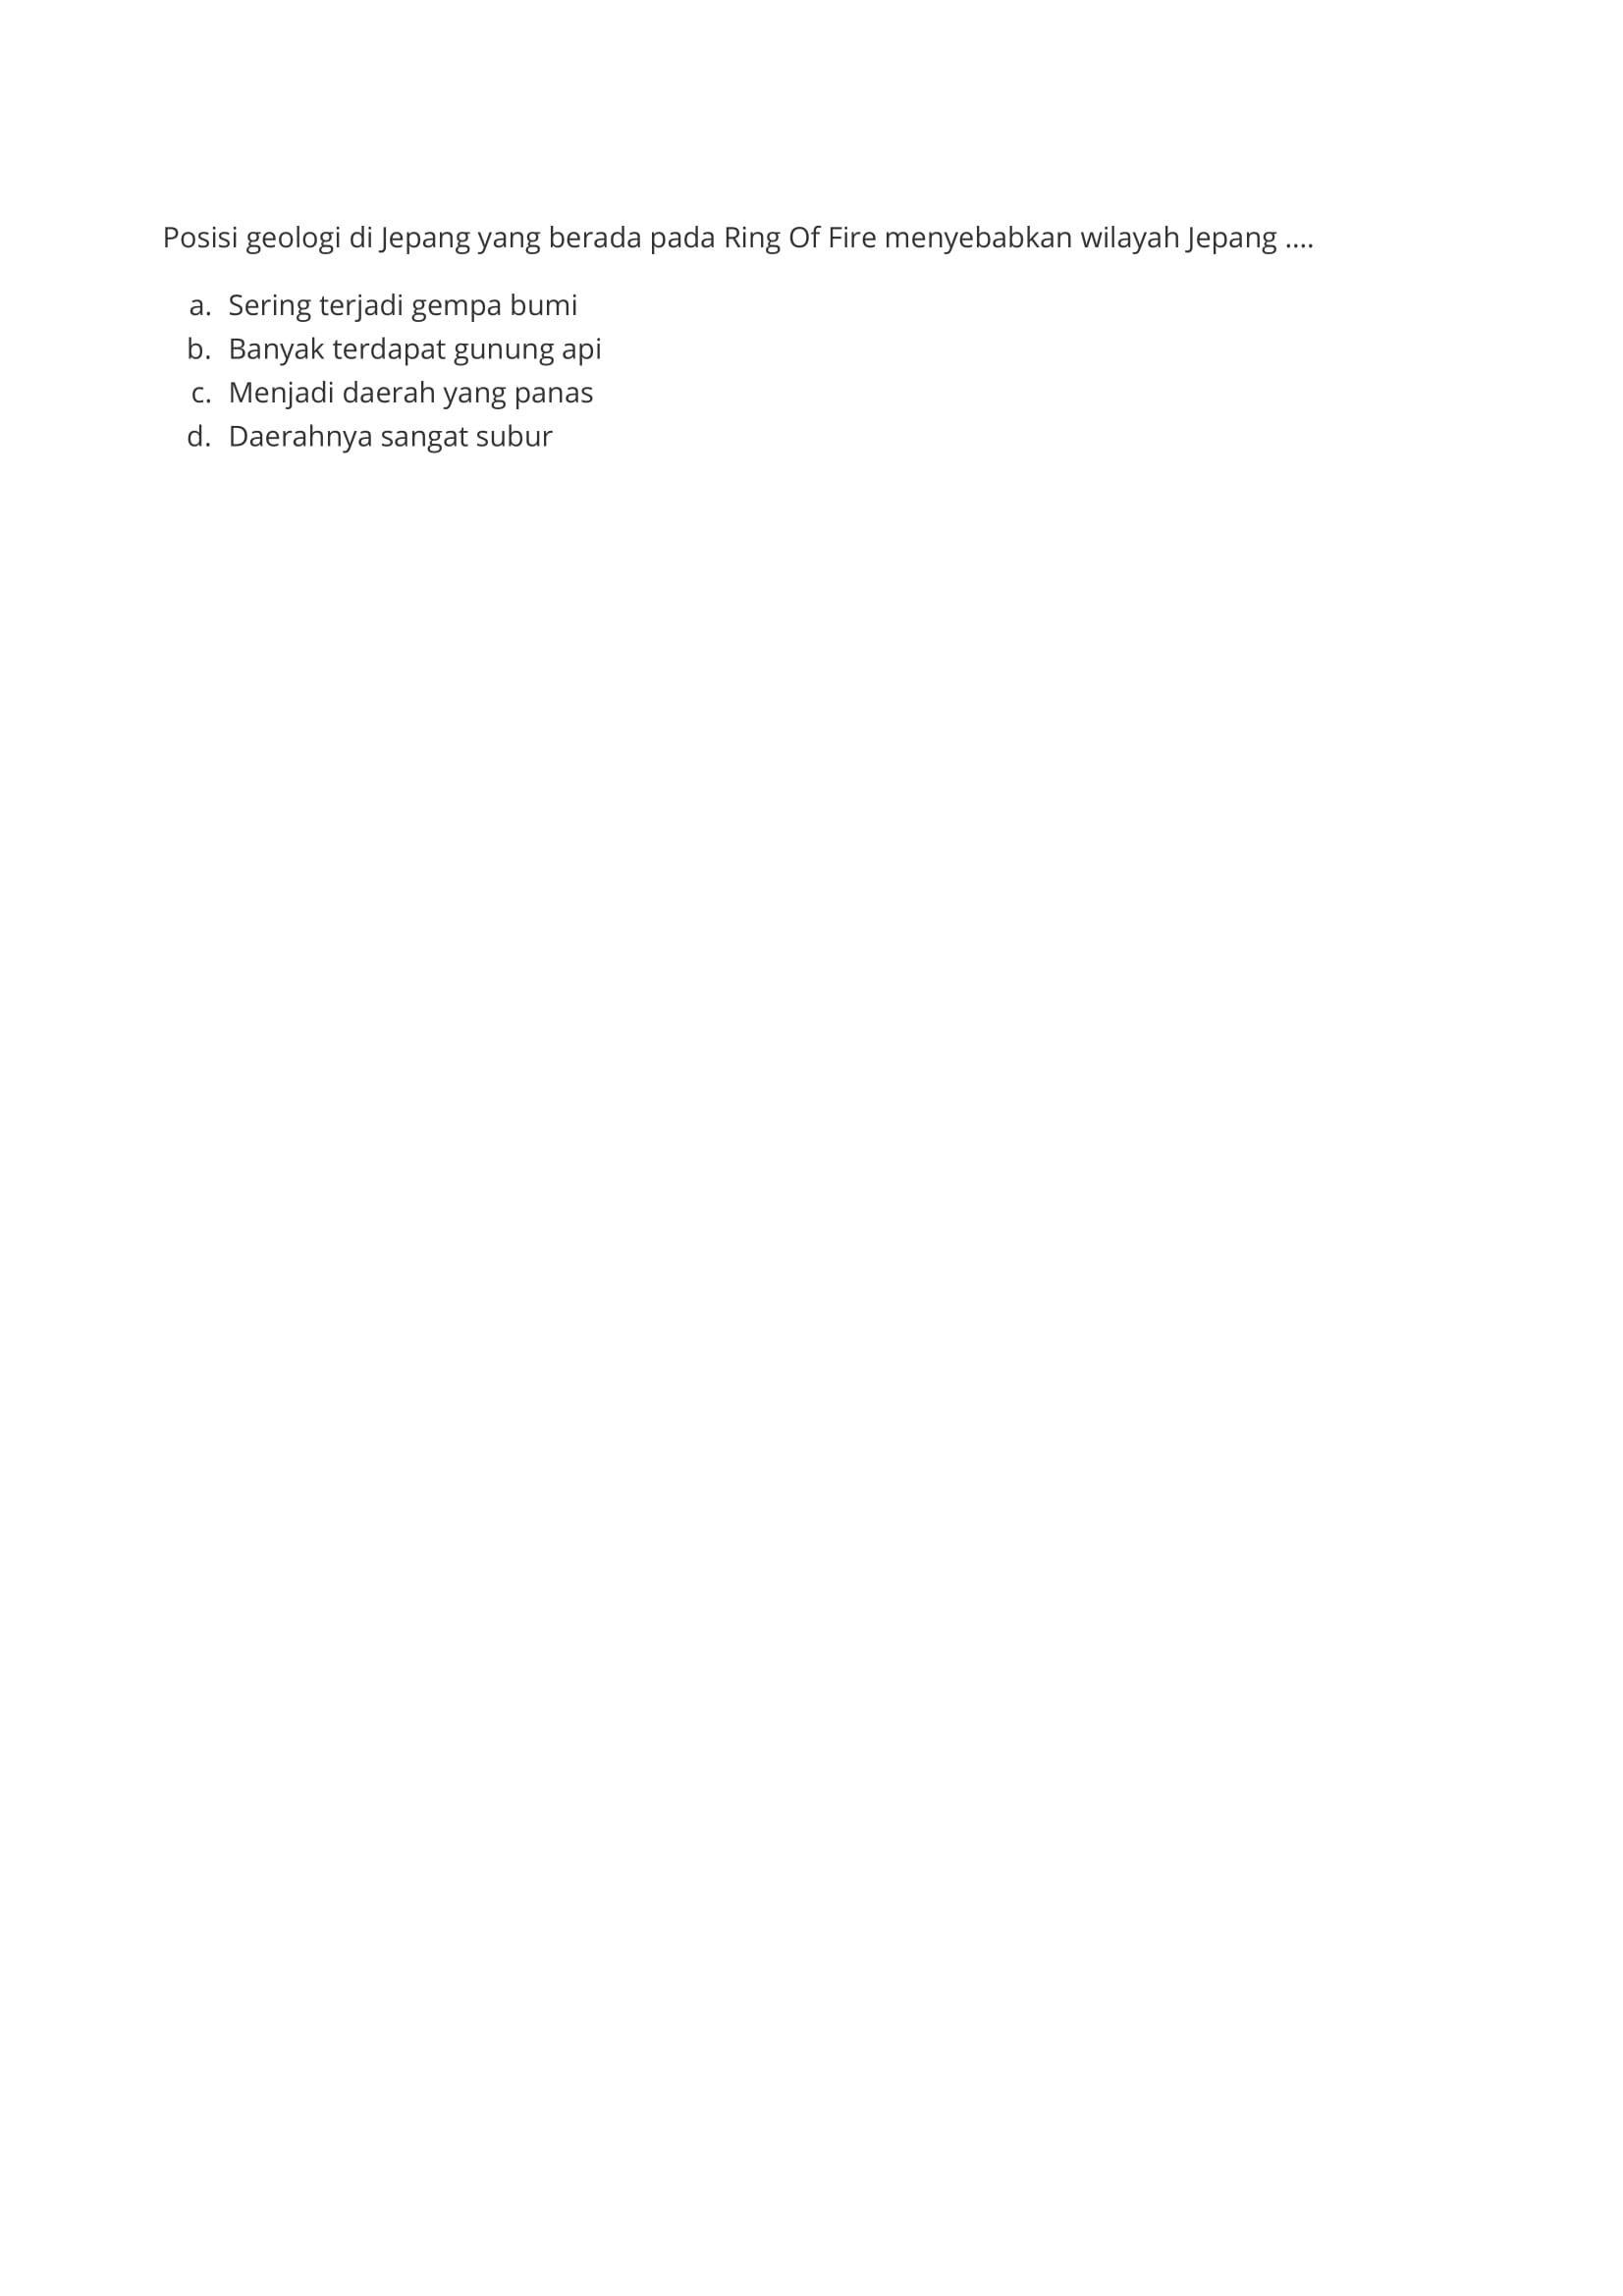 PDF Unduh Soal Ips Kelas 9 Semester 1 Bab 1 PDF secara gratis